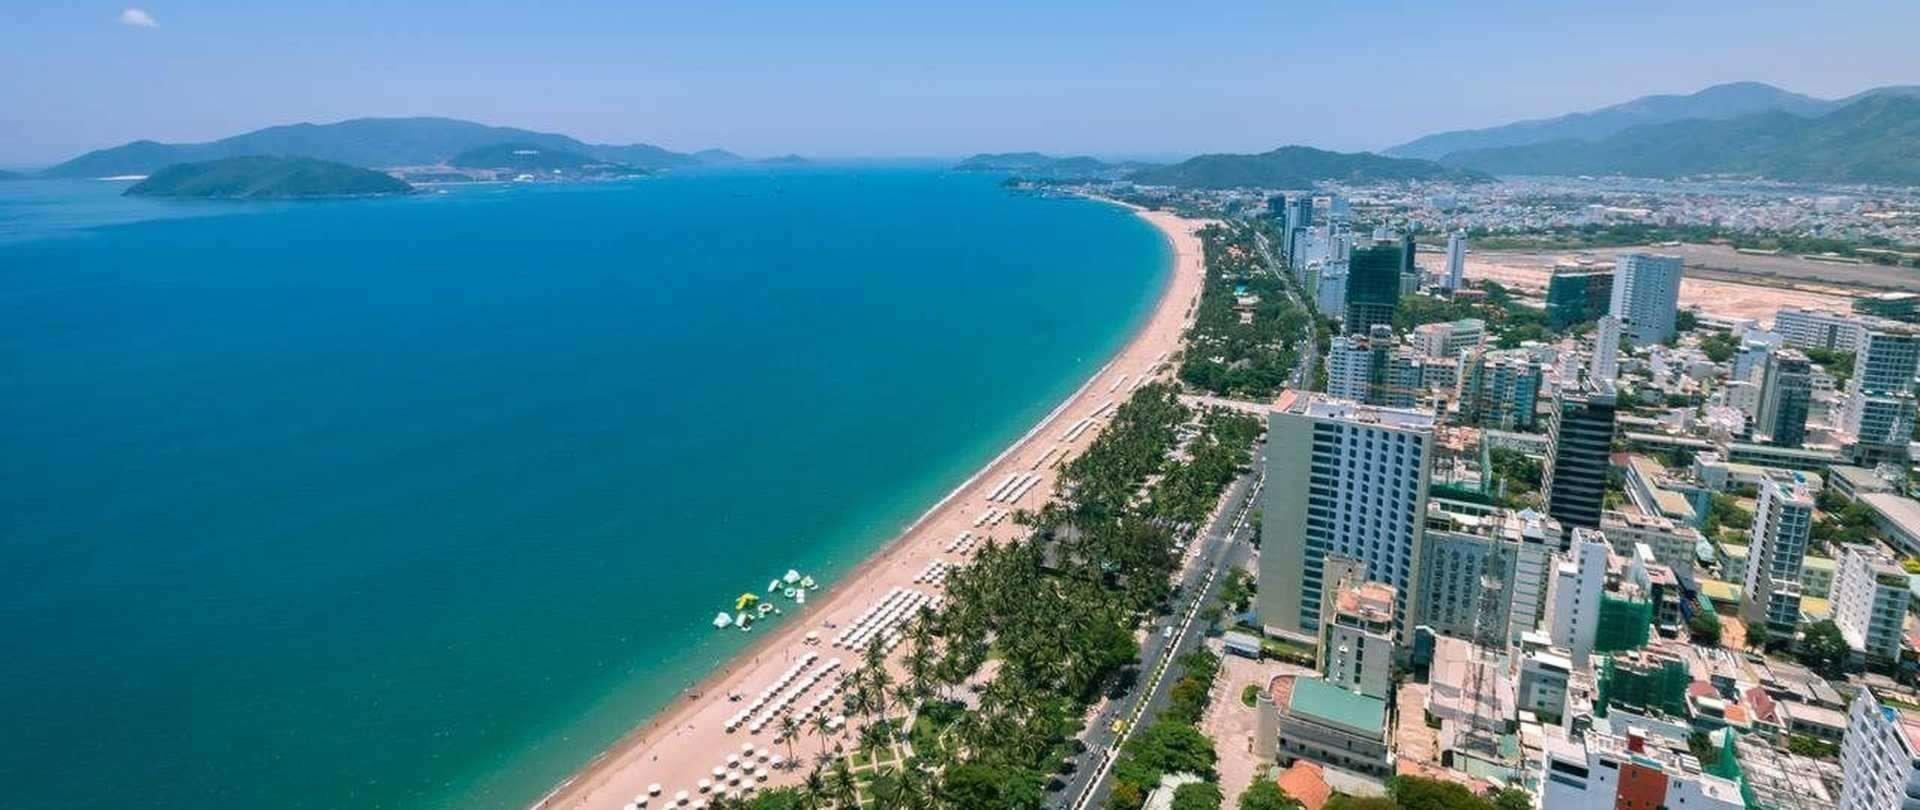 14-Day Luxury Vietnam - Sun, Sea & Sand - Vietnam Itinerary